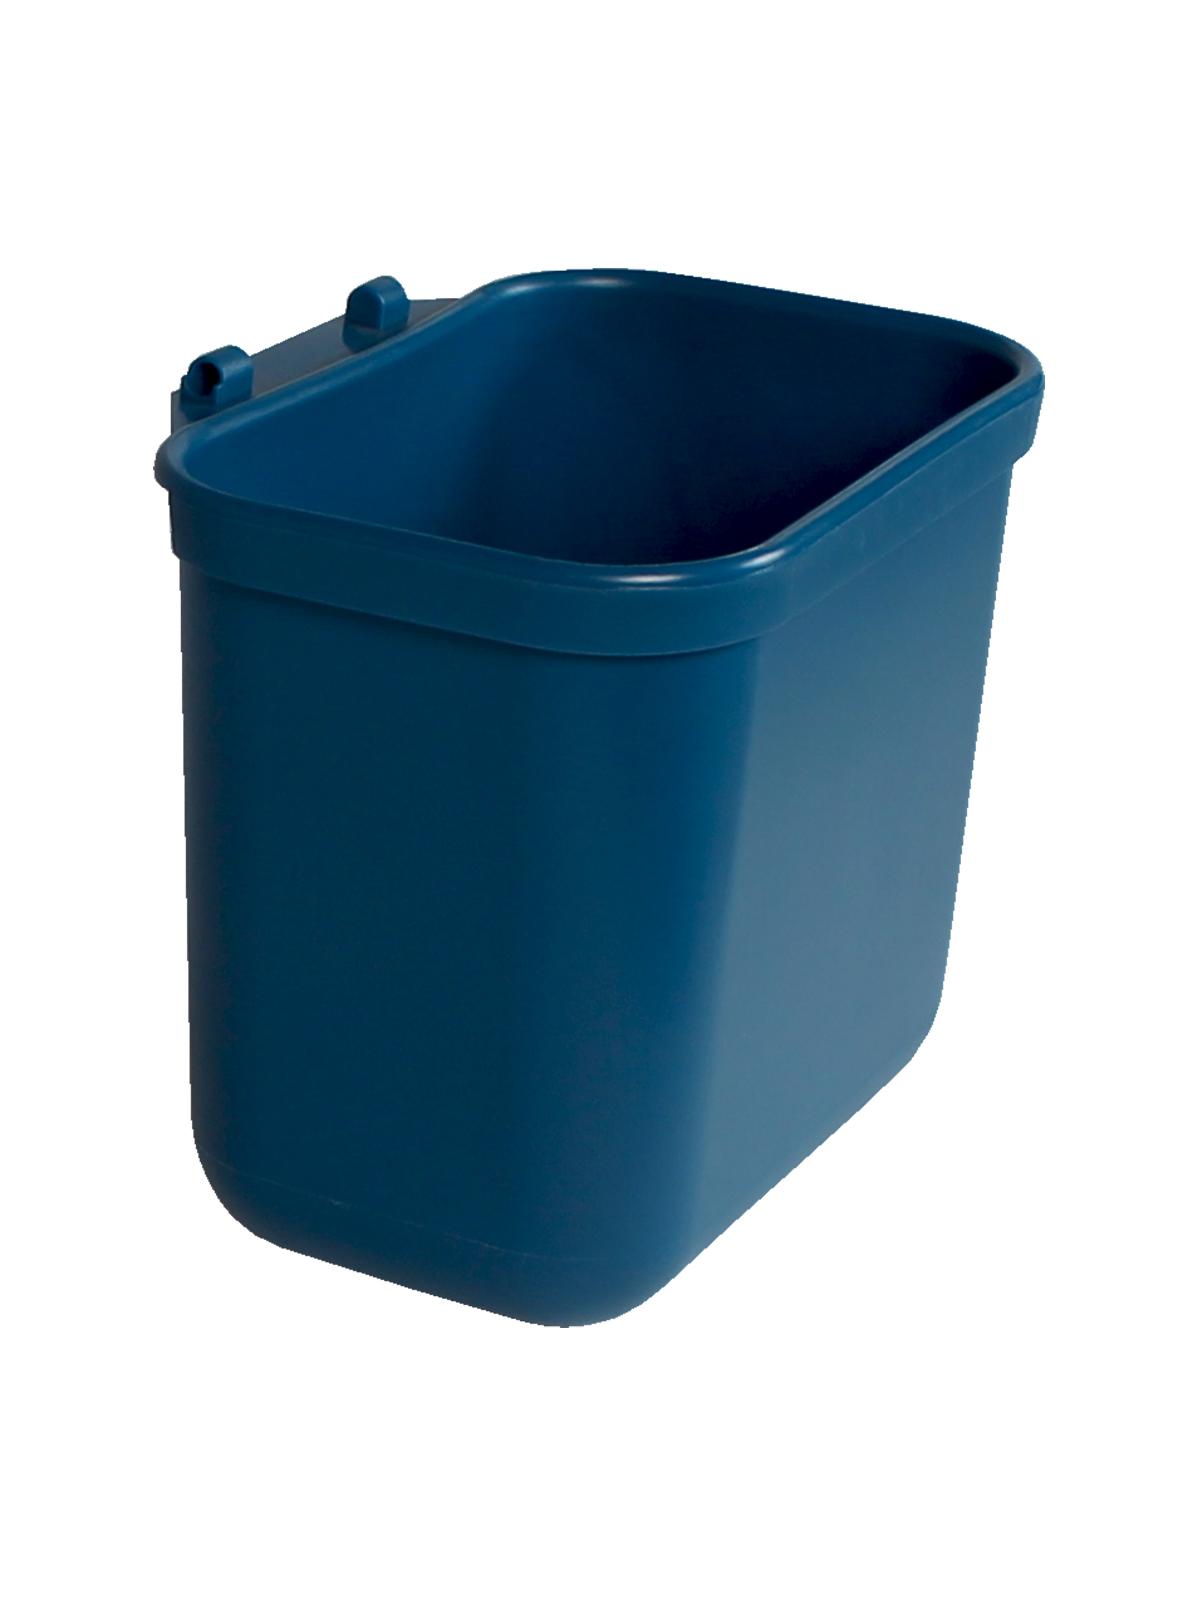 HANGING WASTE BASKET - Single - Body - Busch Blue